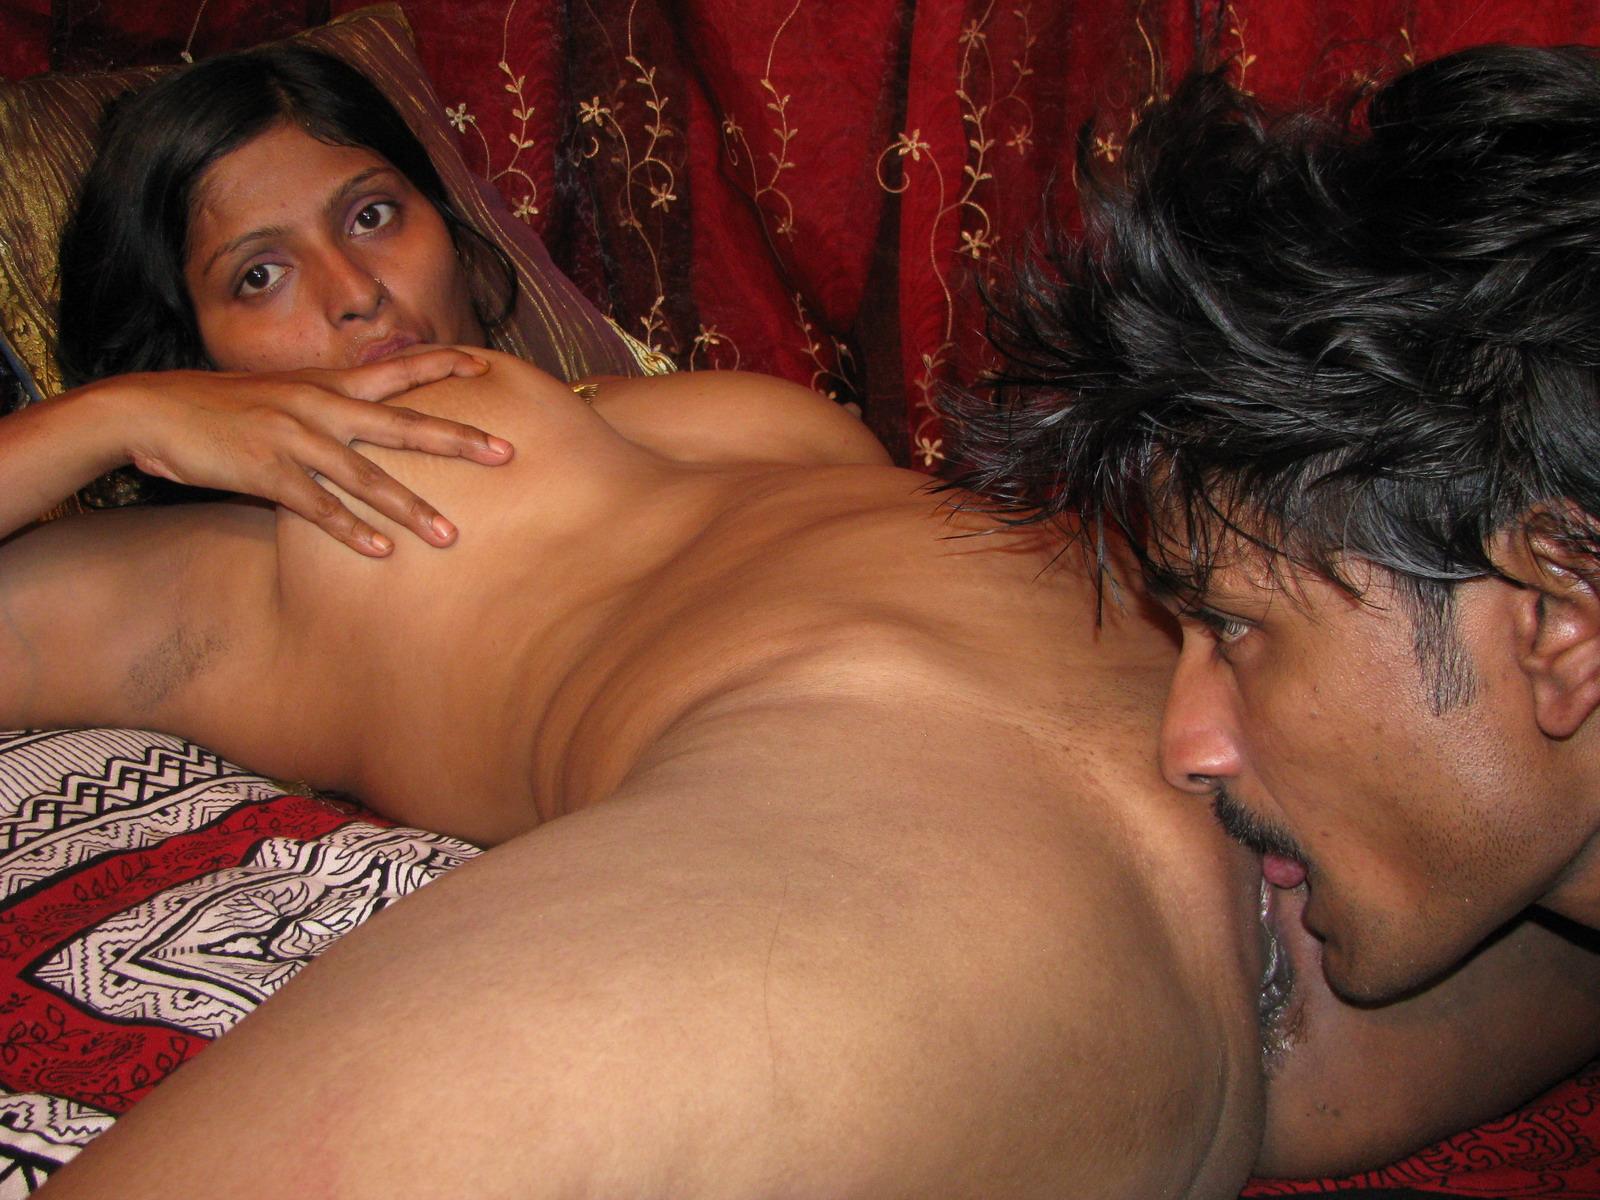 Desi girl online xxx adult hd chick